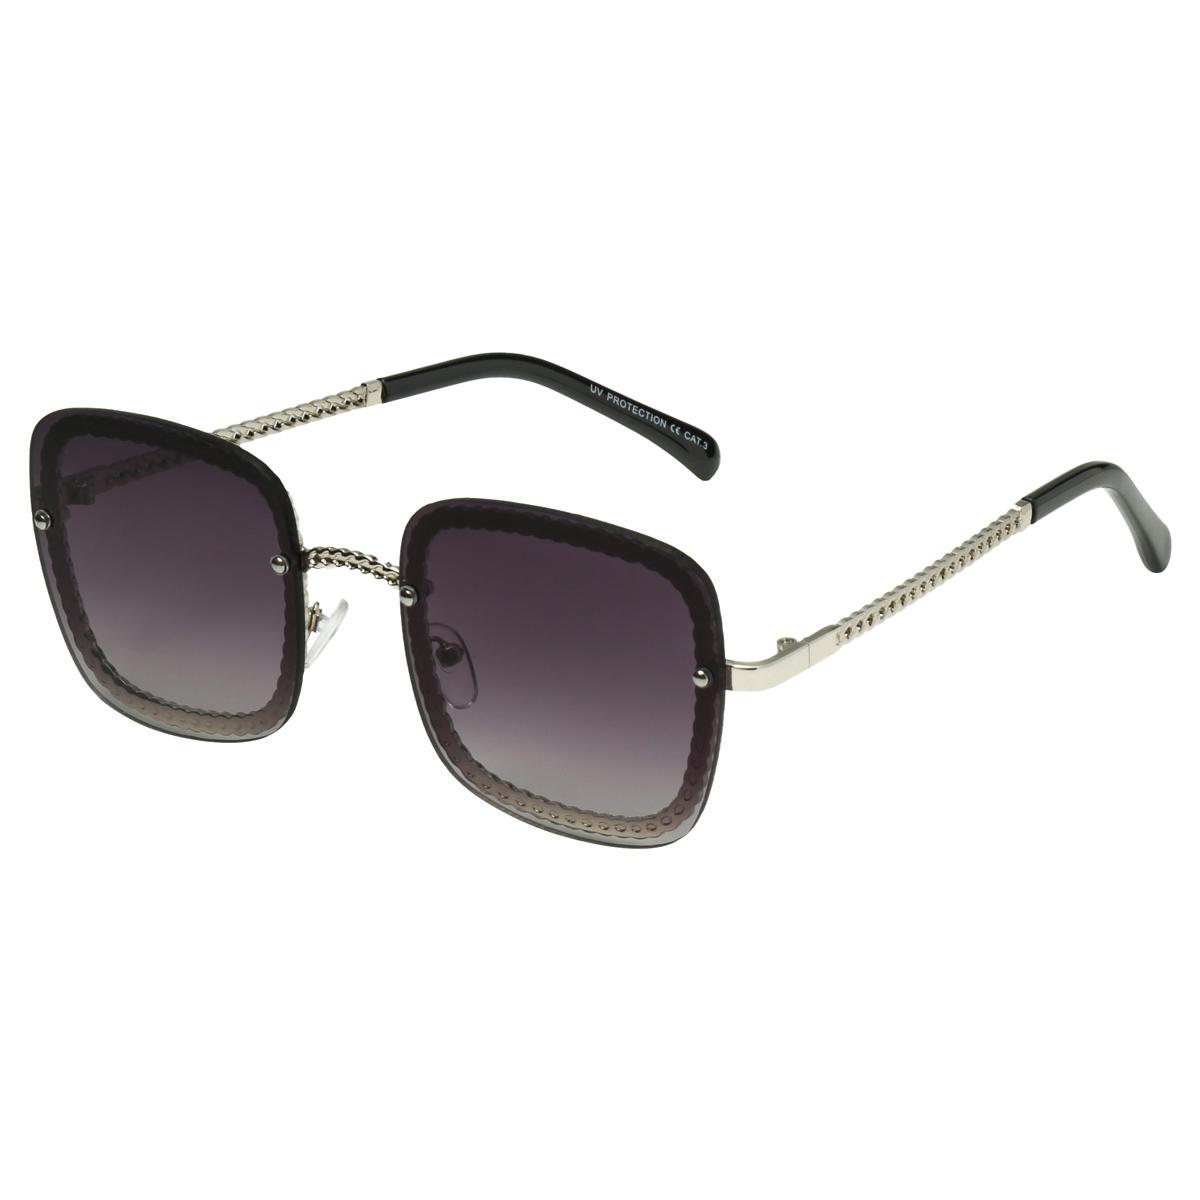 Sunglasses Style Icon